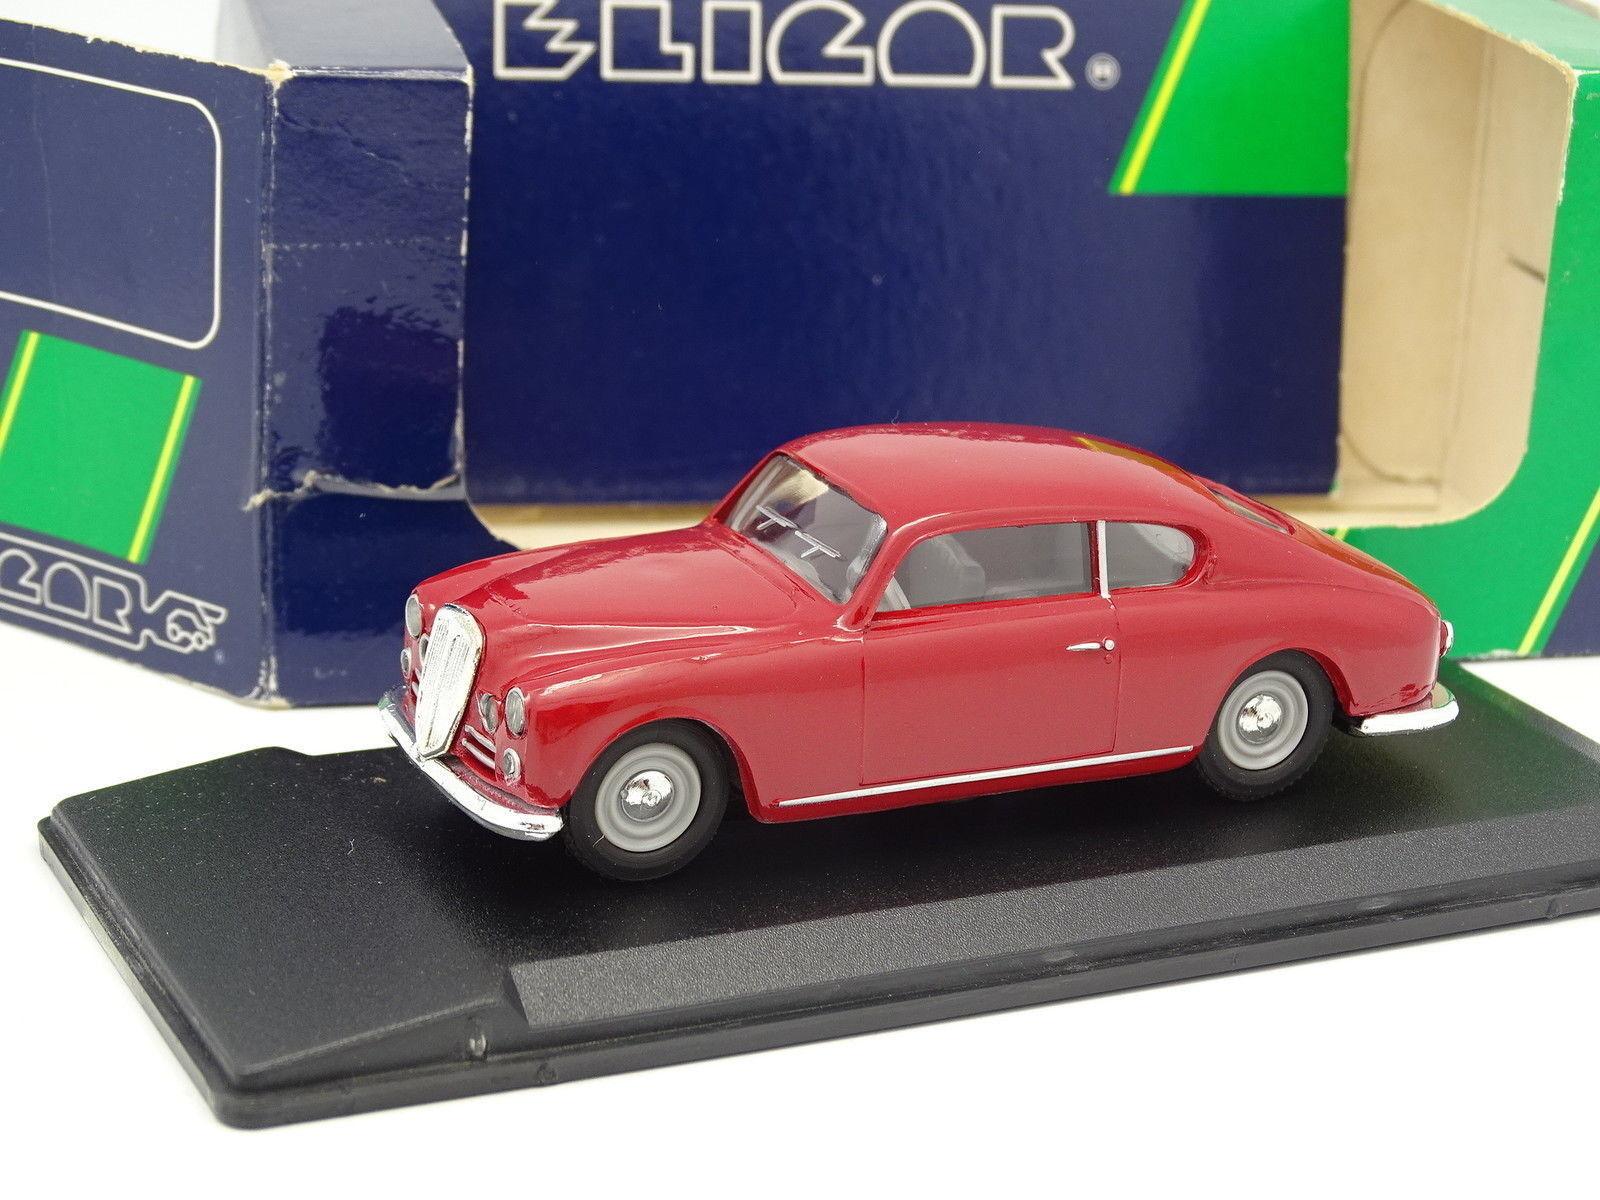 Eligor Eligor Eligor 1 43 - Lancia Aurelia B20 red 8c433c